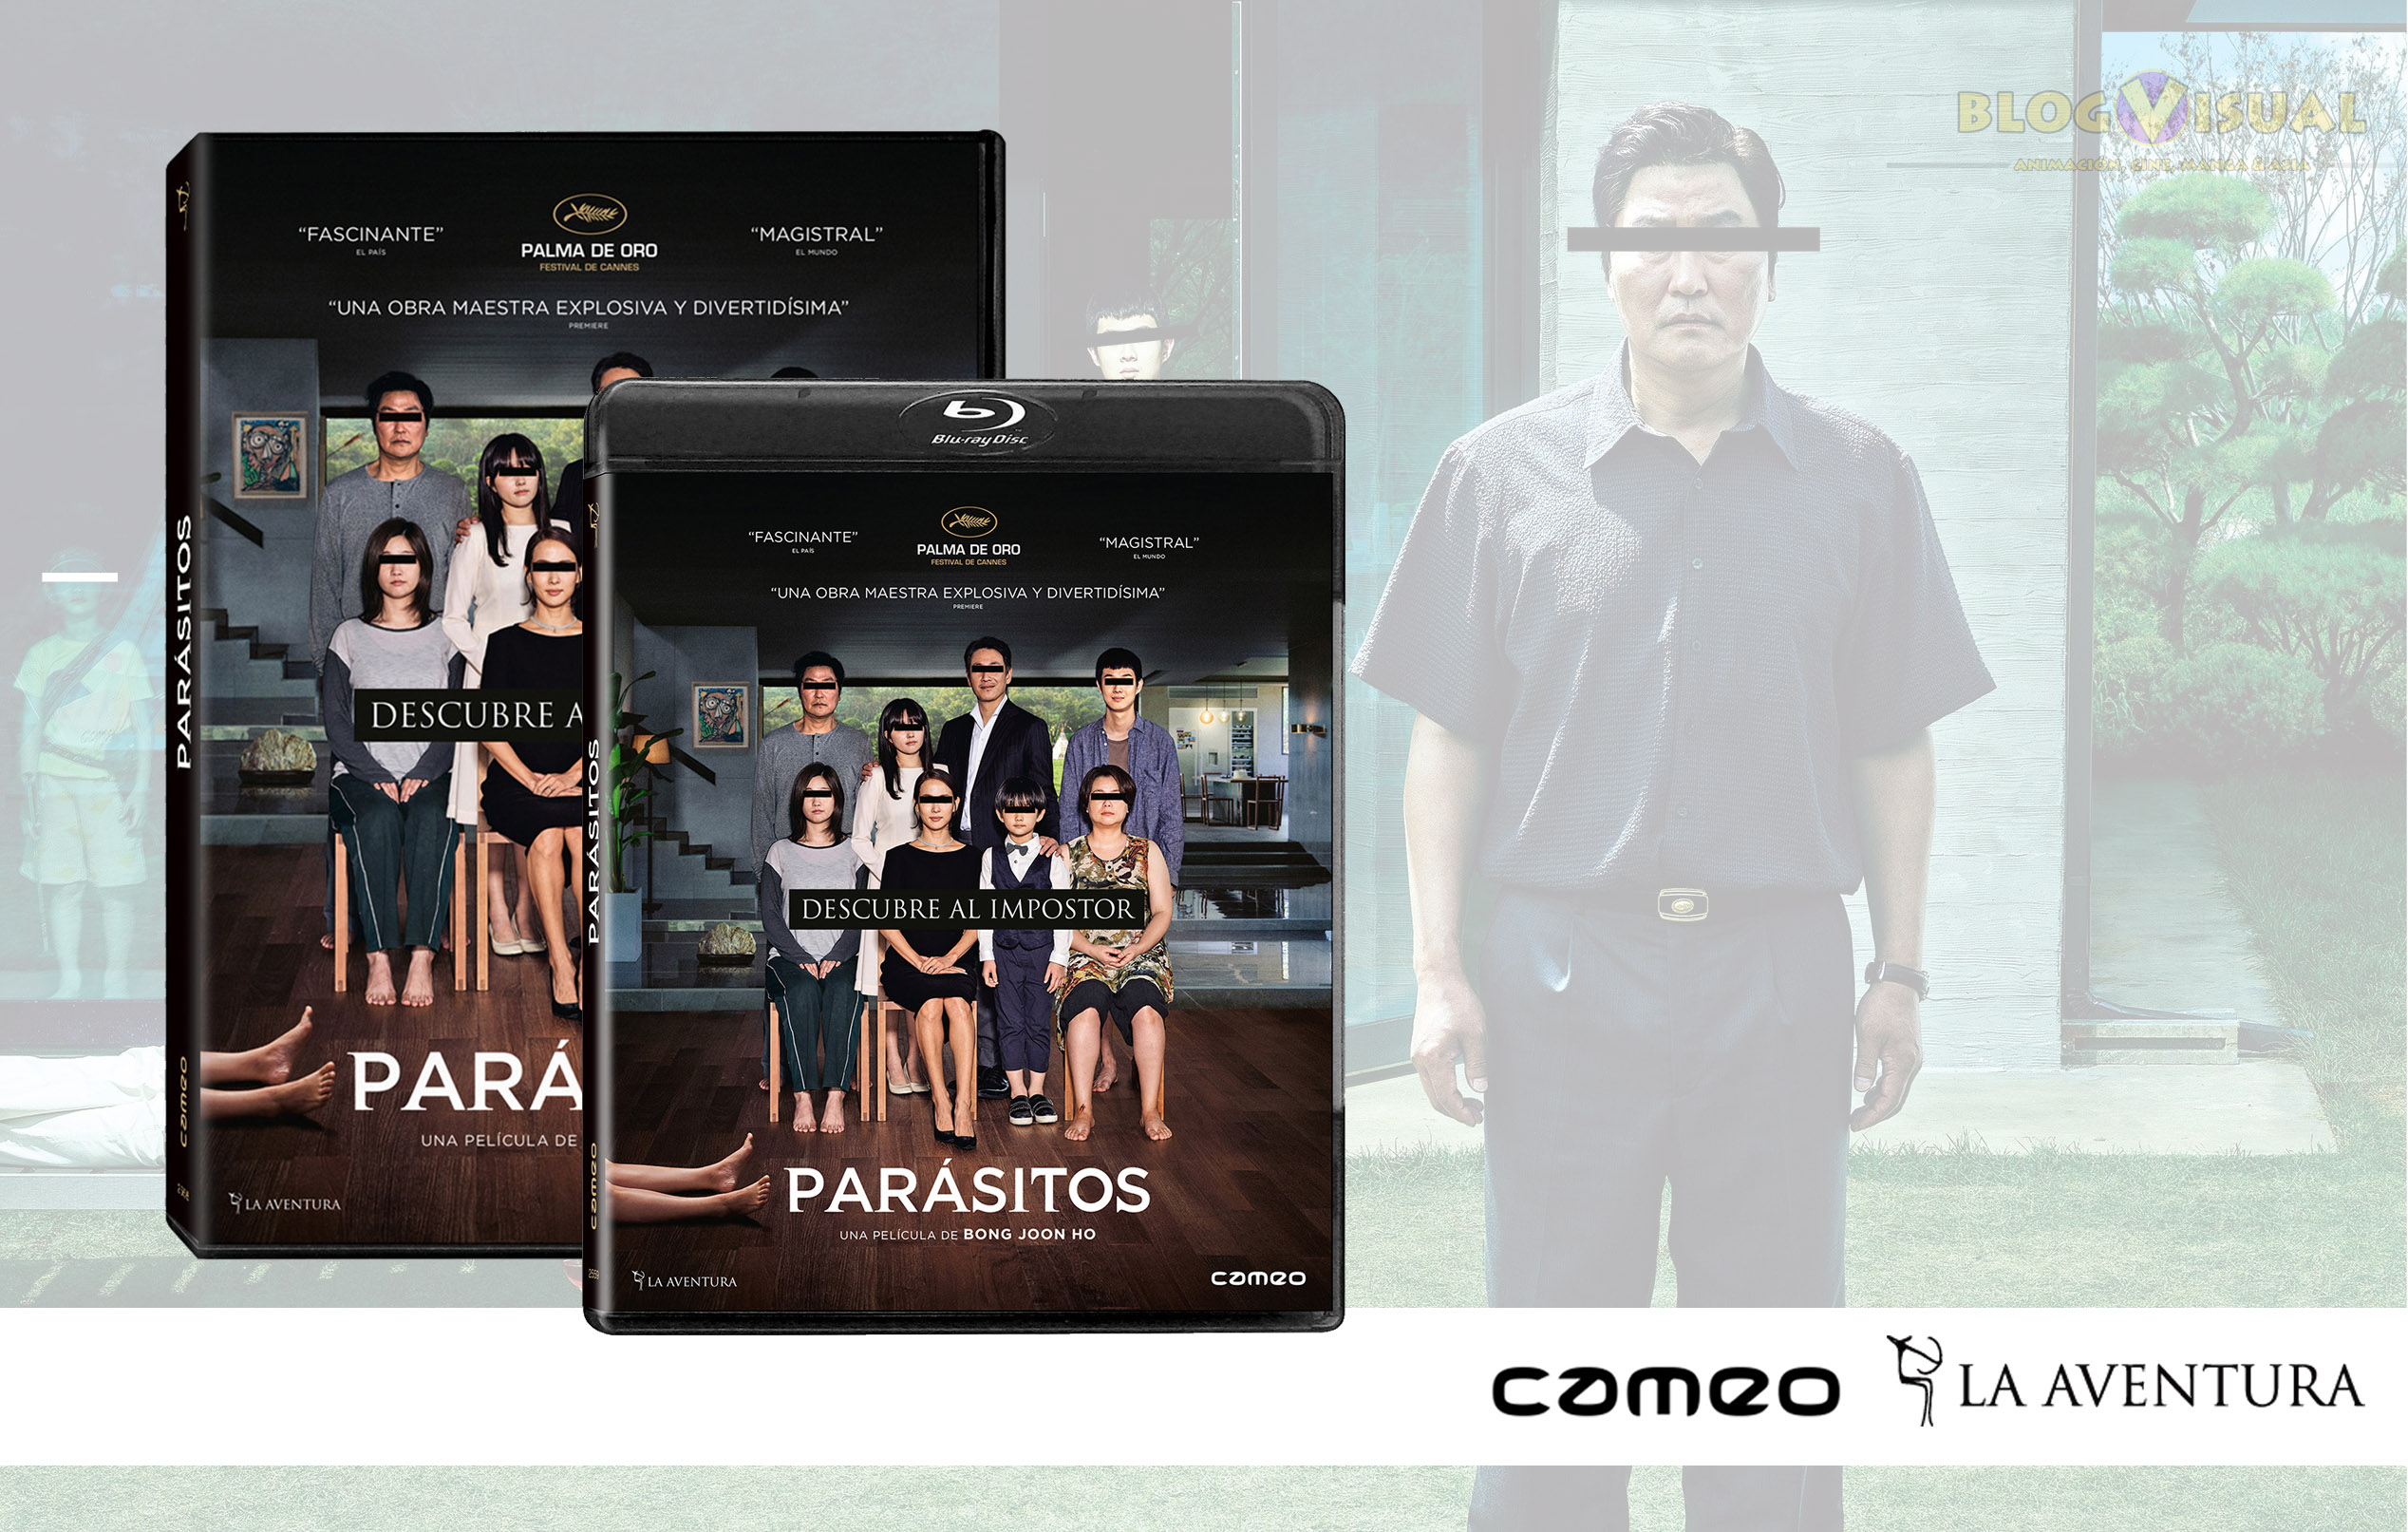 parasitos-banner-02-2020.jpg